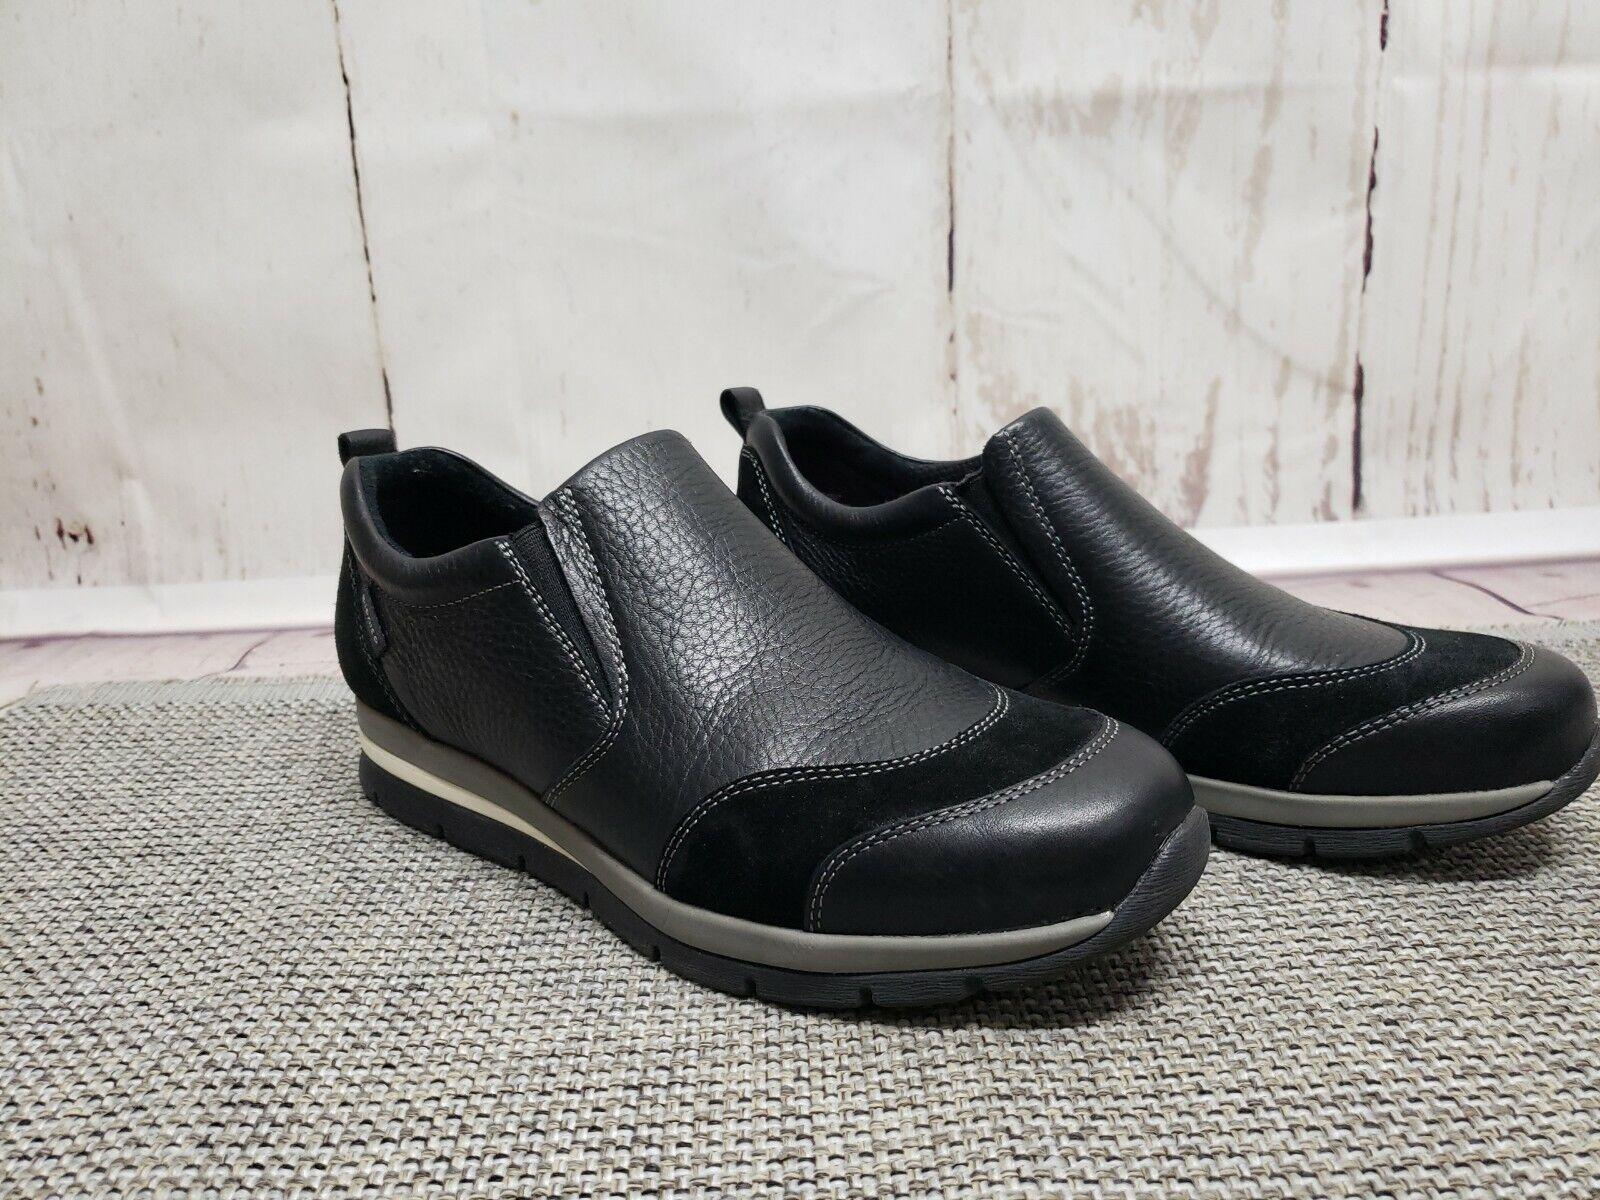 Bionica Tampa Black Leather Womens Shoes Sz 8.5 M Slip On Comfort Walking